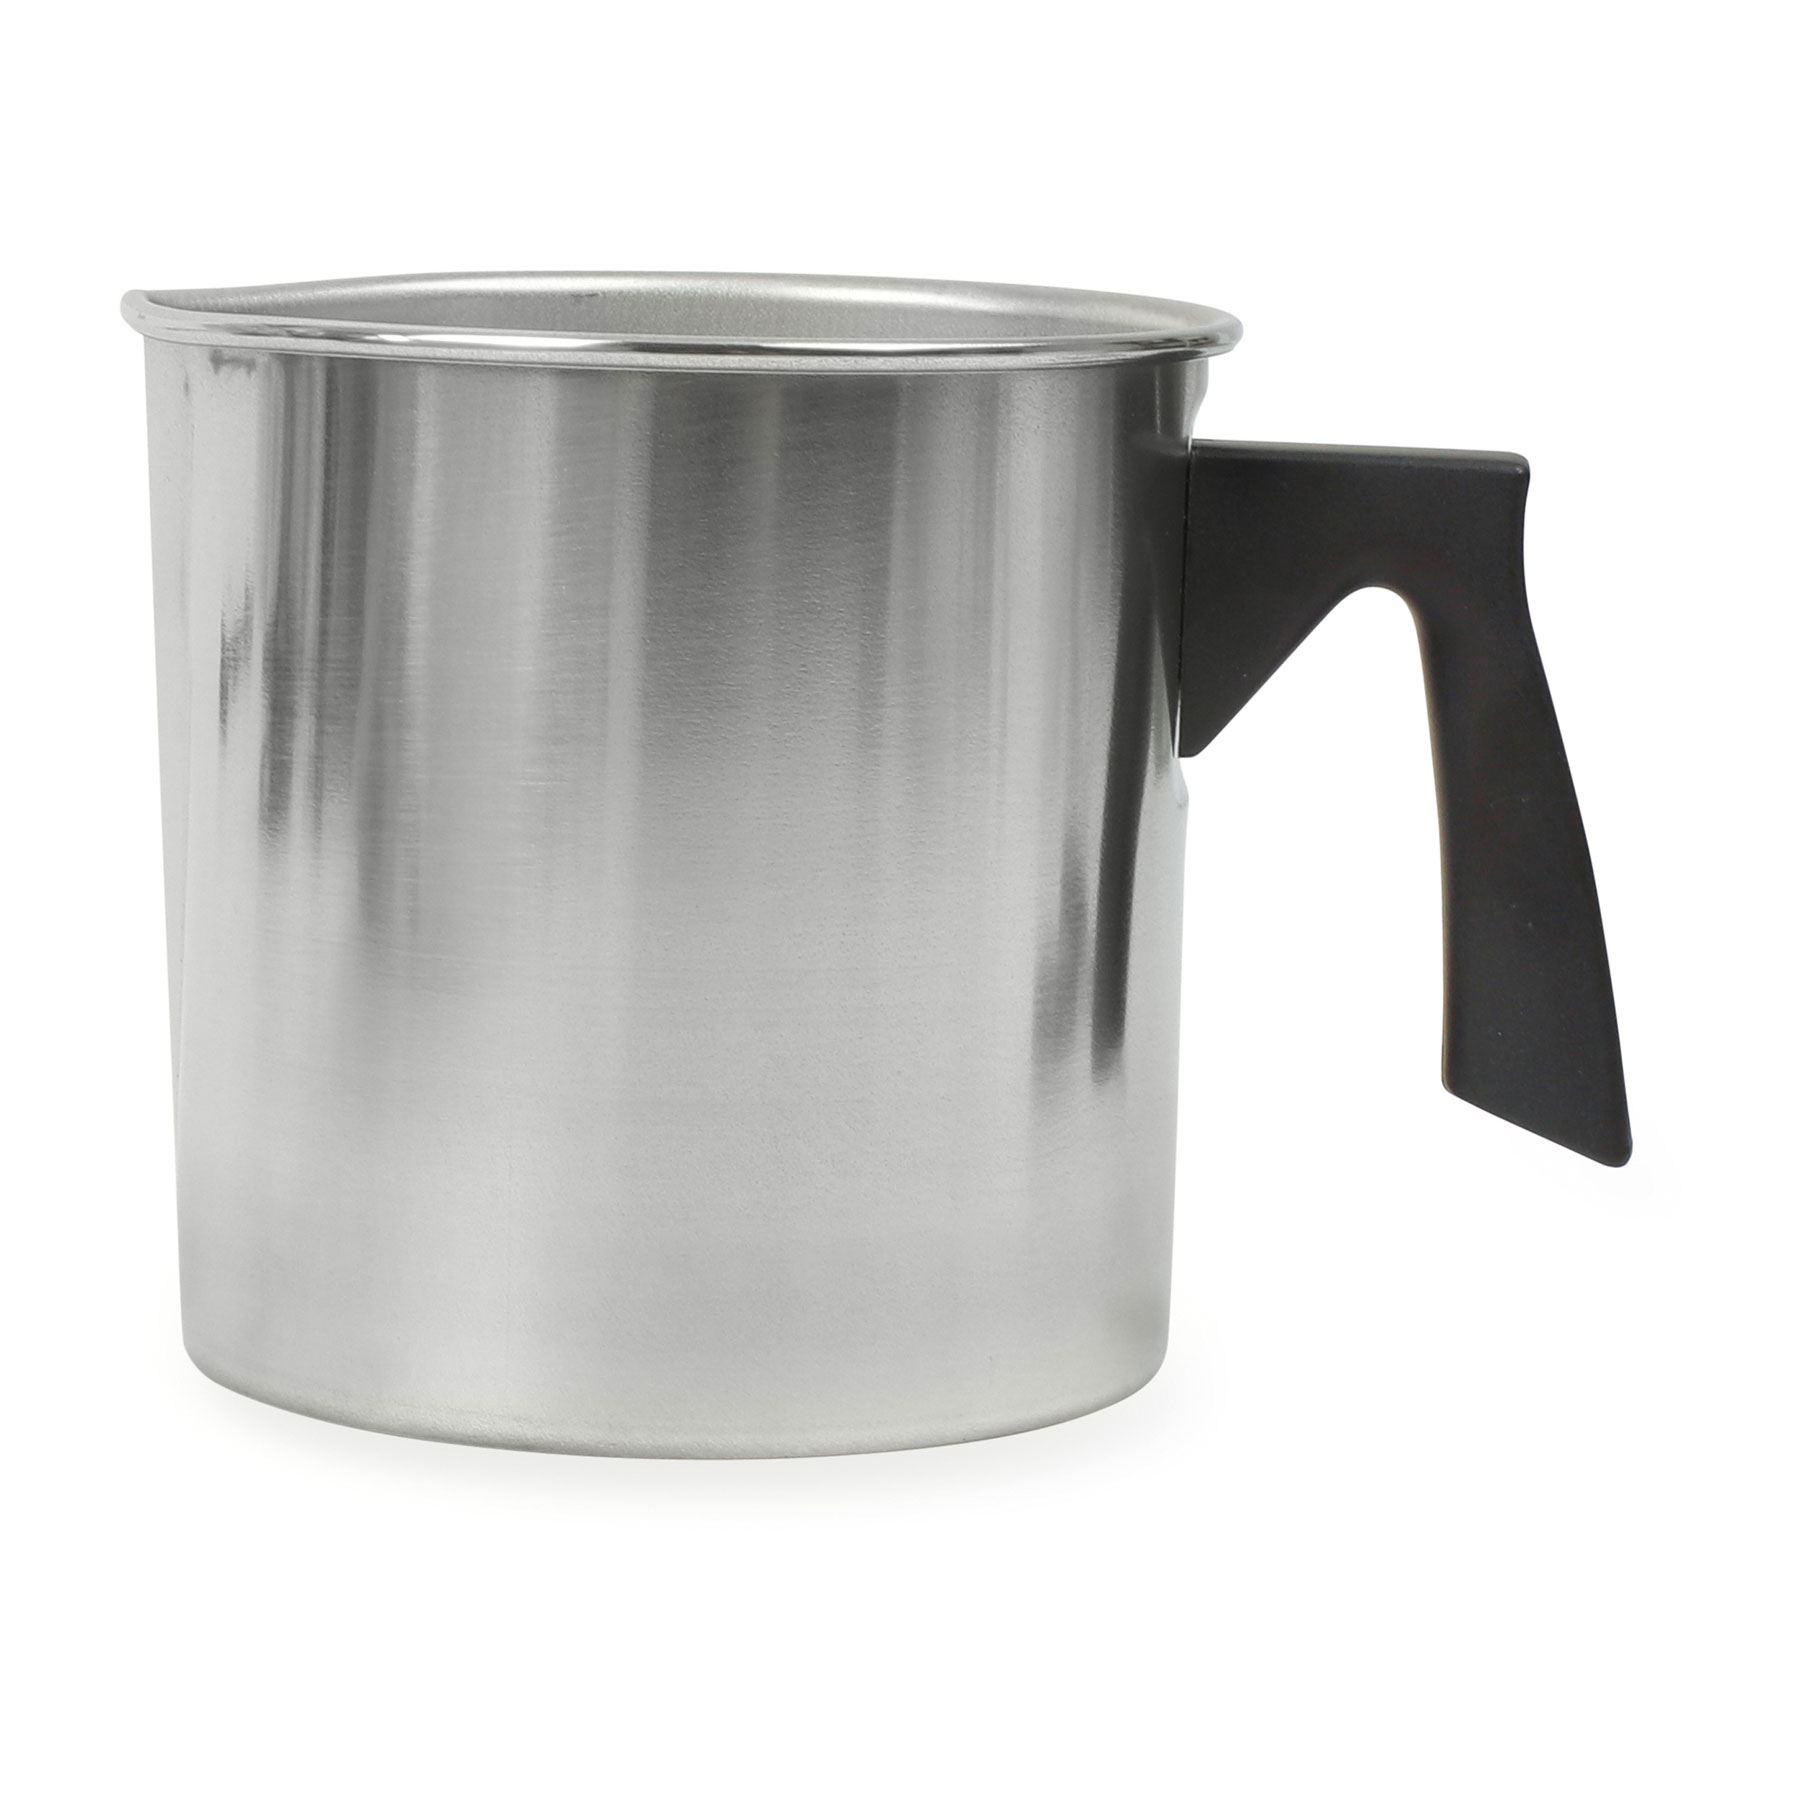 Your-Crafts-Candle-Makers-Wax-Melting-Pitcher-amp-Tools-Aluminium-Pot thumbnail 12